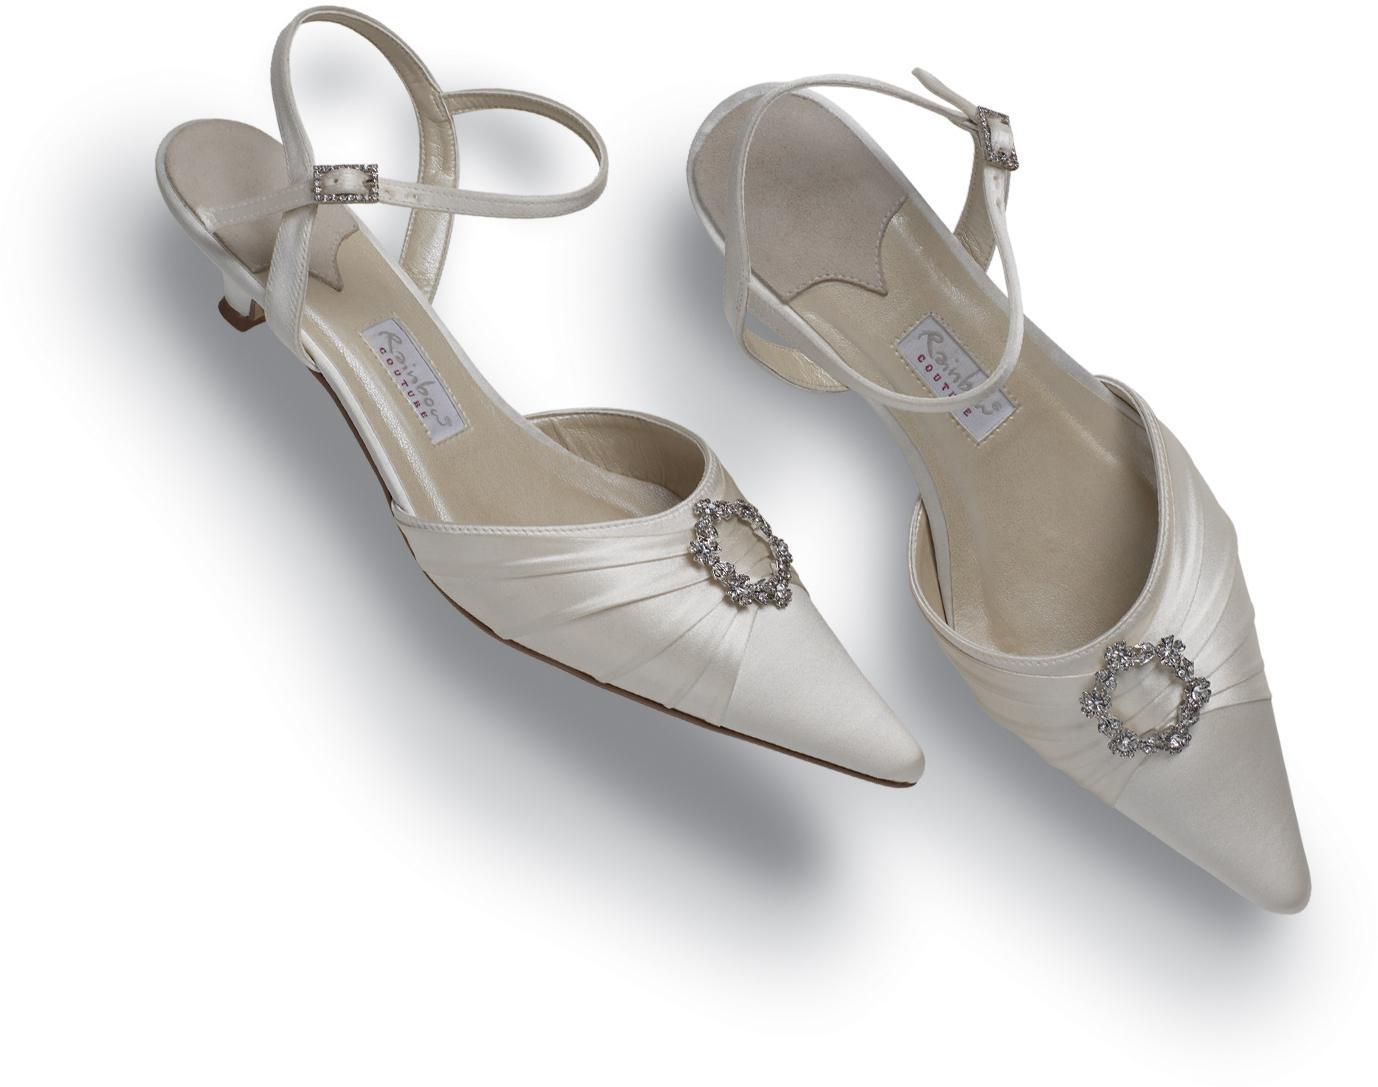 BODINI - Rainbow Couture cipő. 29.500 Ft, 3 cm sarok